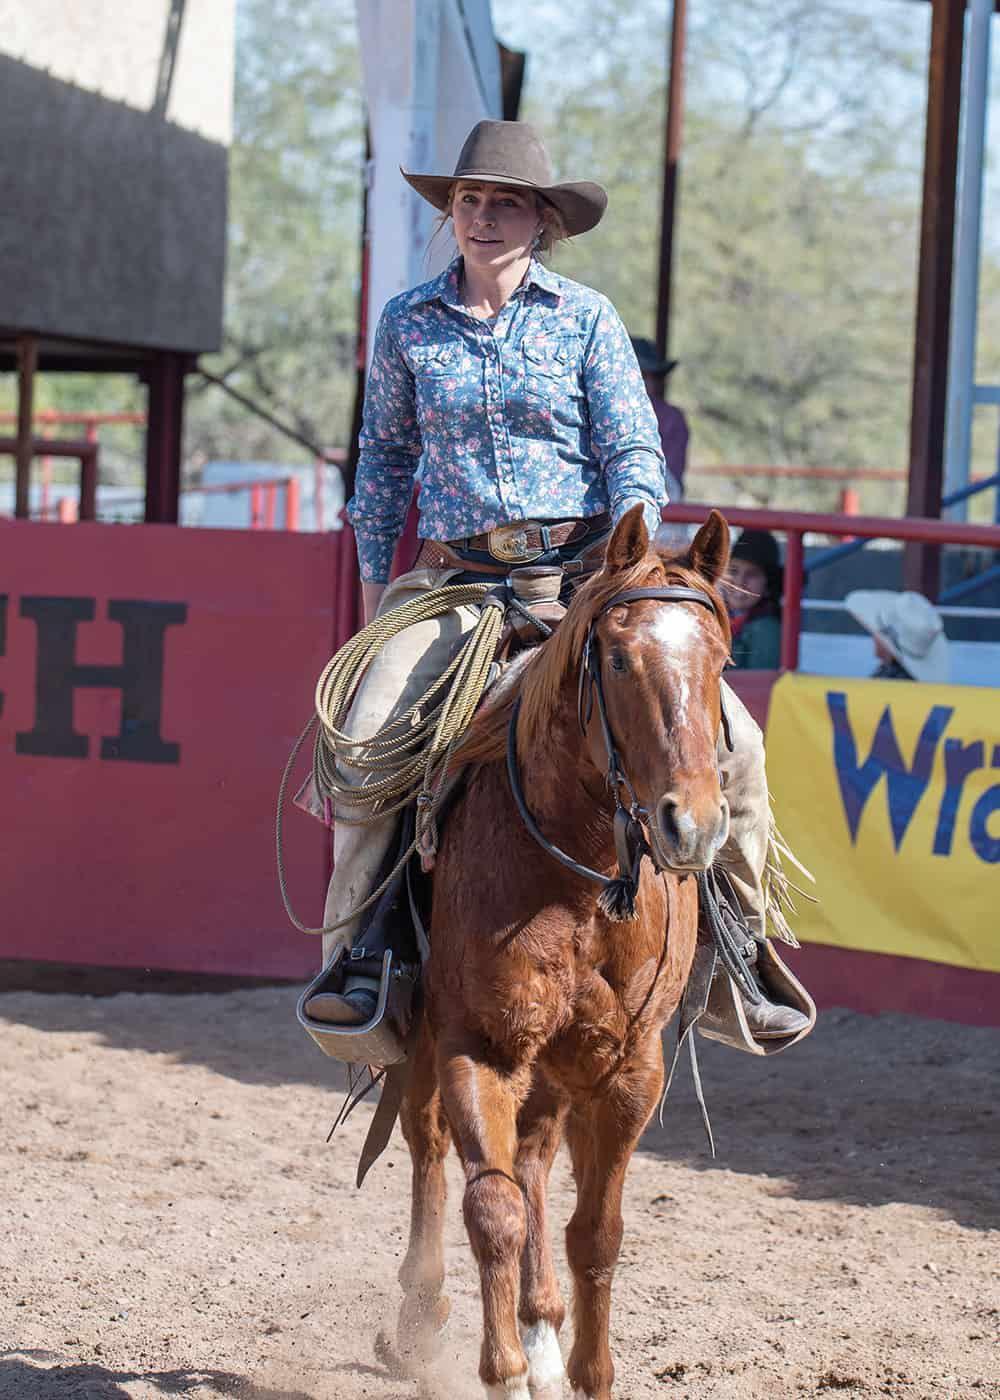 reata brannaman art of the cowgirl horse riding cowgirl magazine